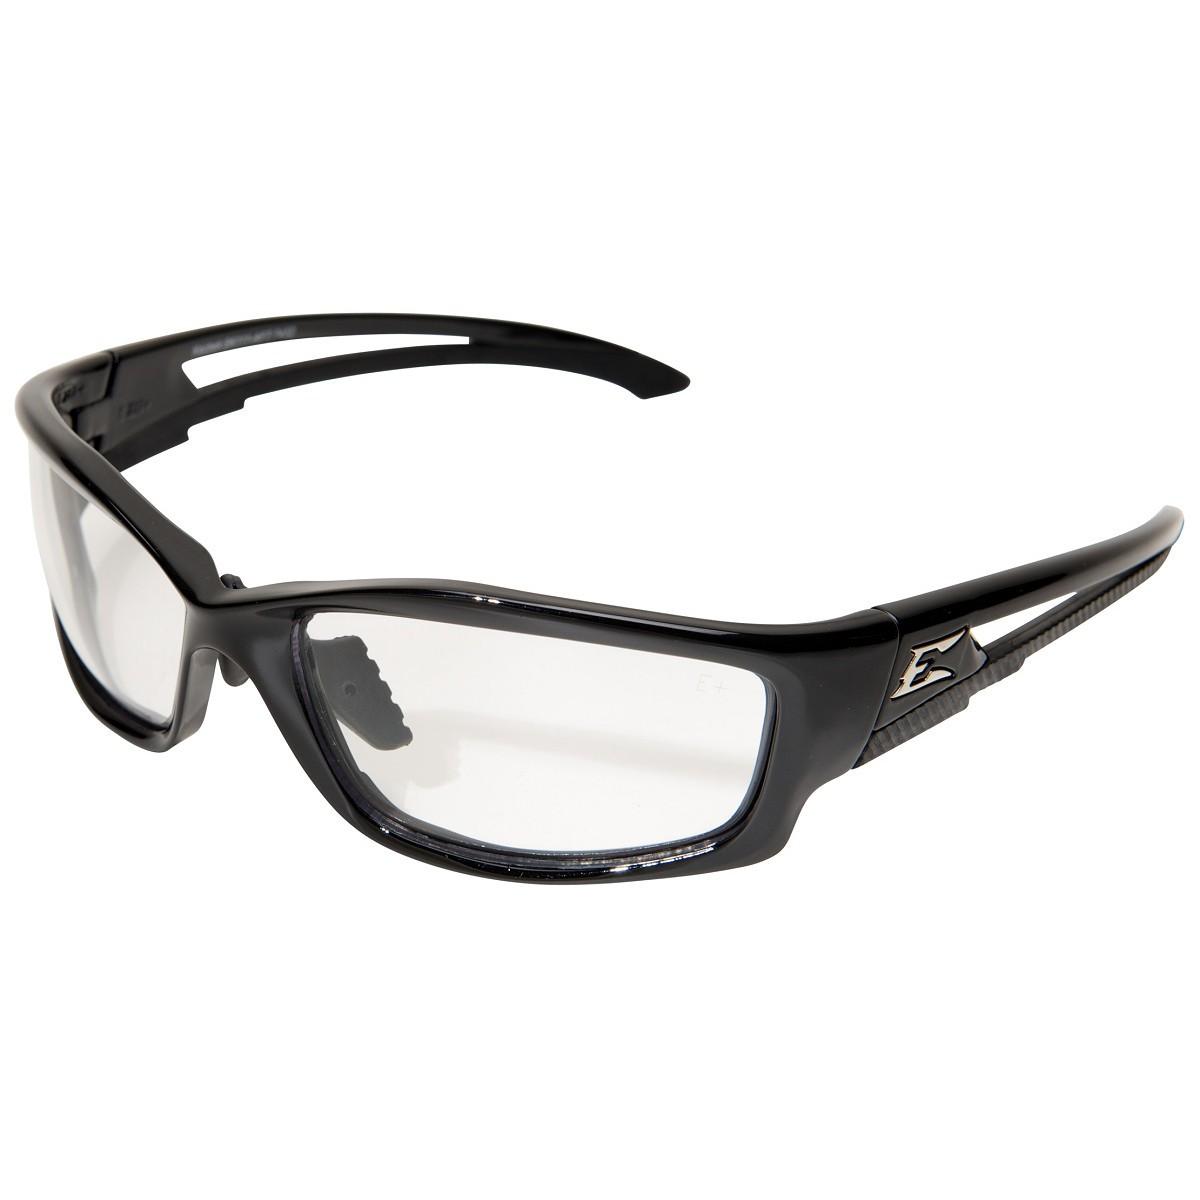 Edge SK111VS-AFT Kazbek Safety Glasses - Black Asian Fit ...